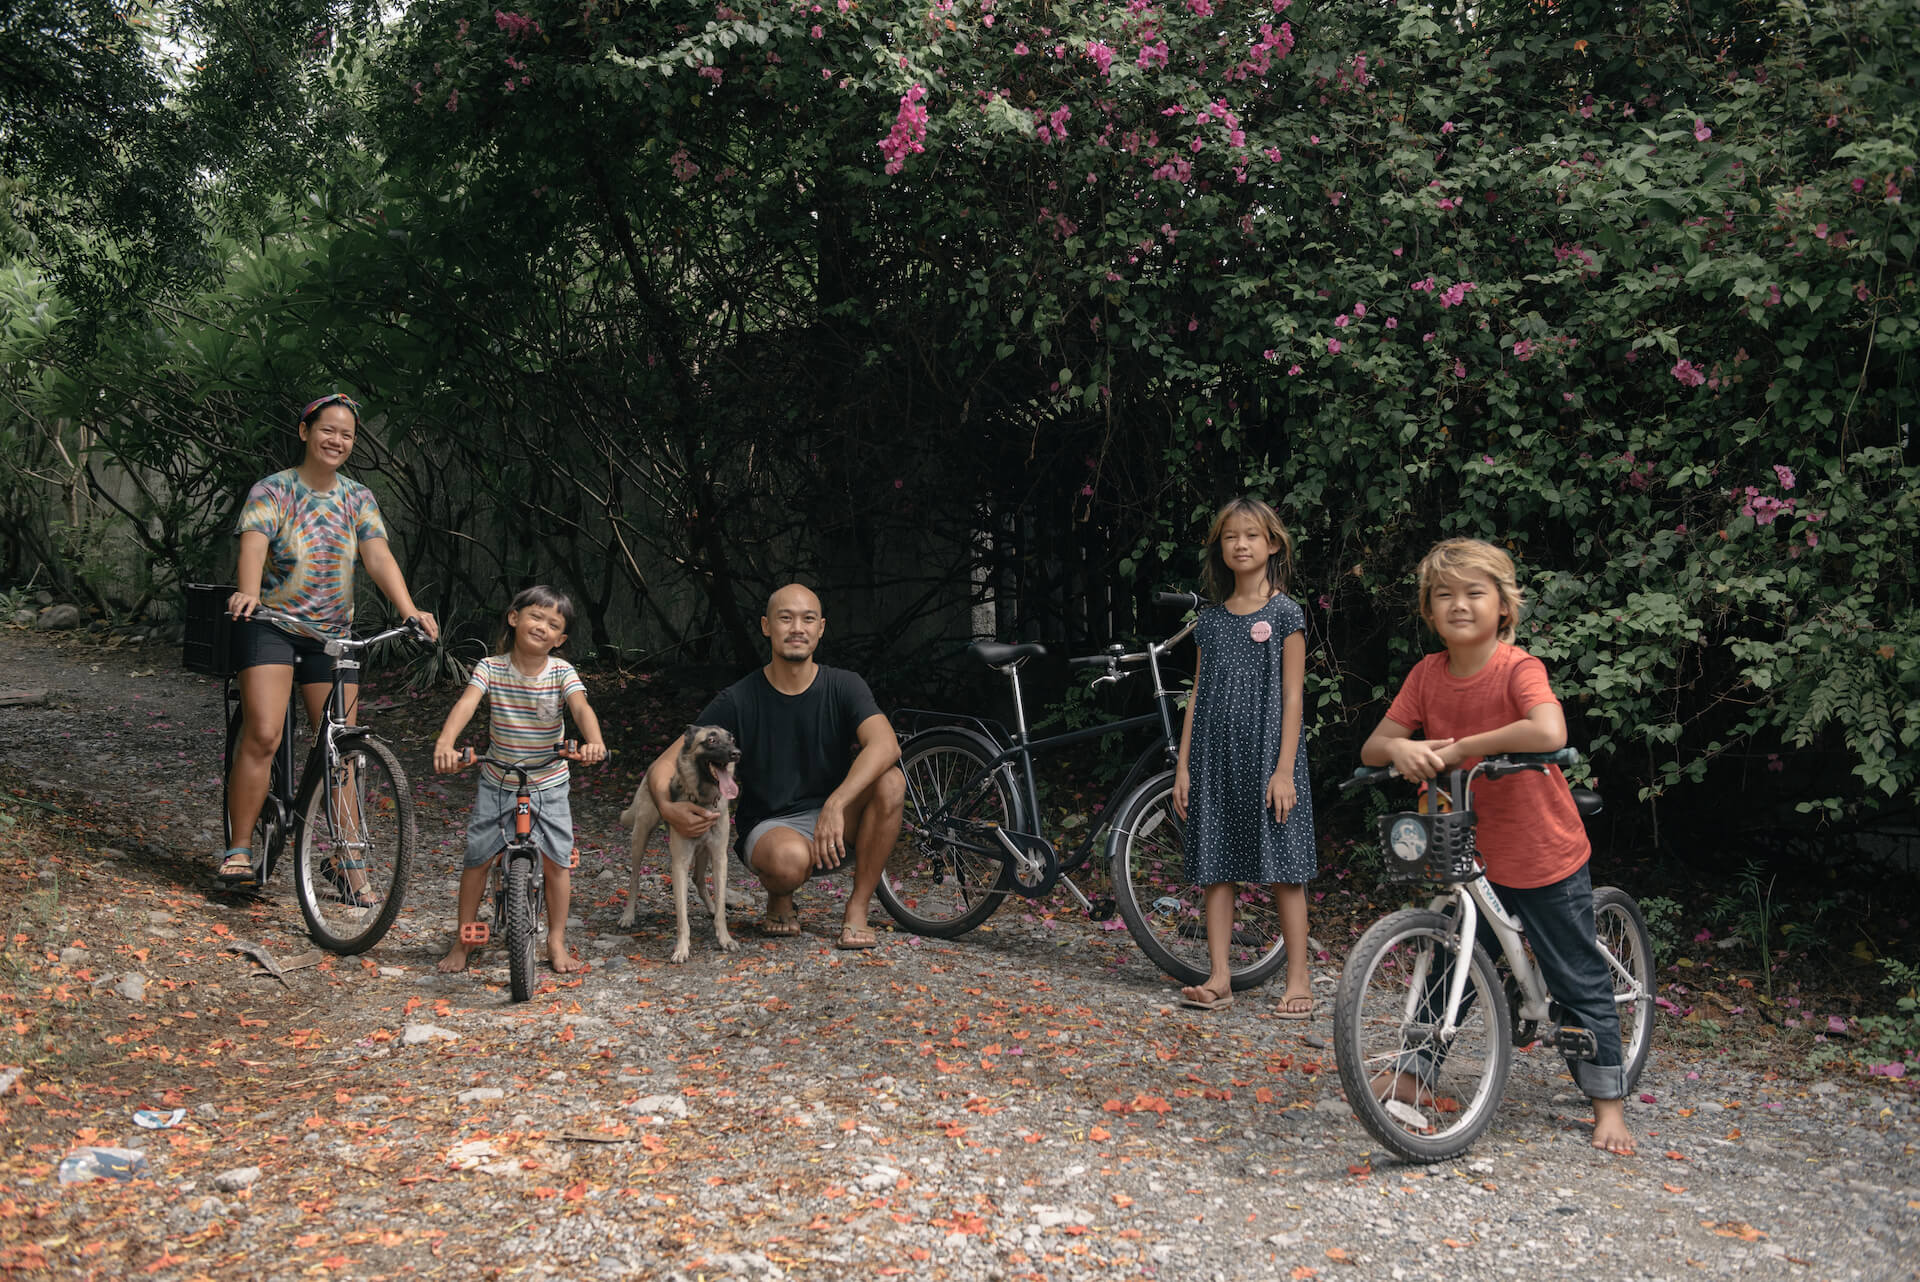 Cosio Family poses with bikes in La Union, photo by Tarish Zamora